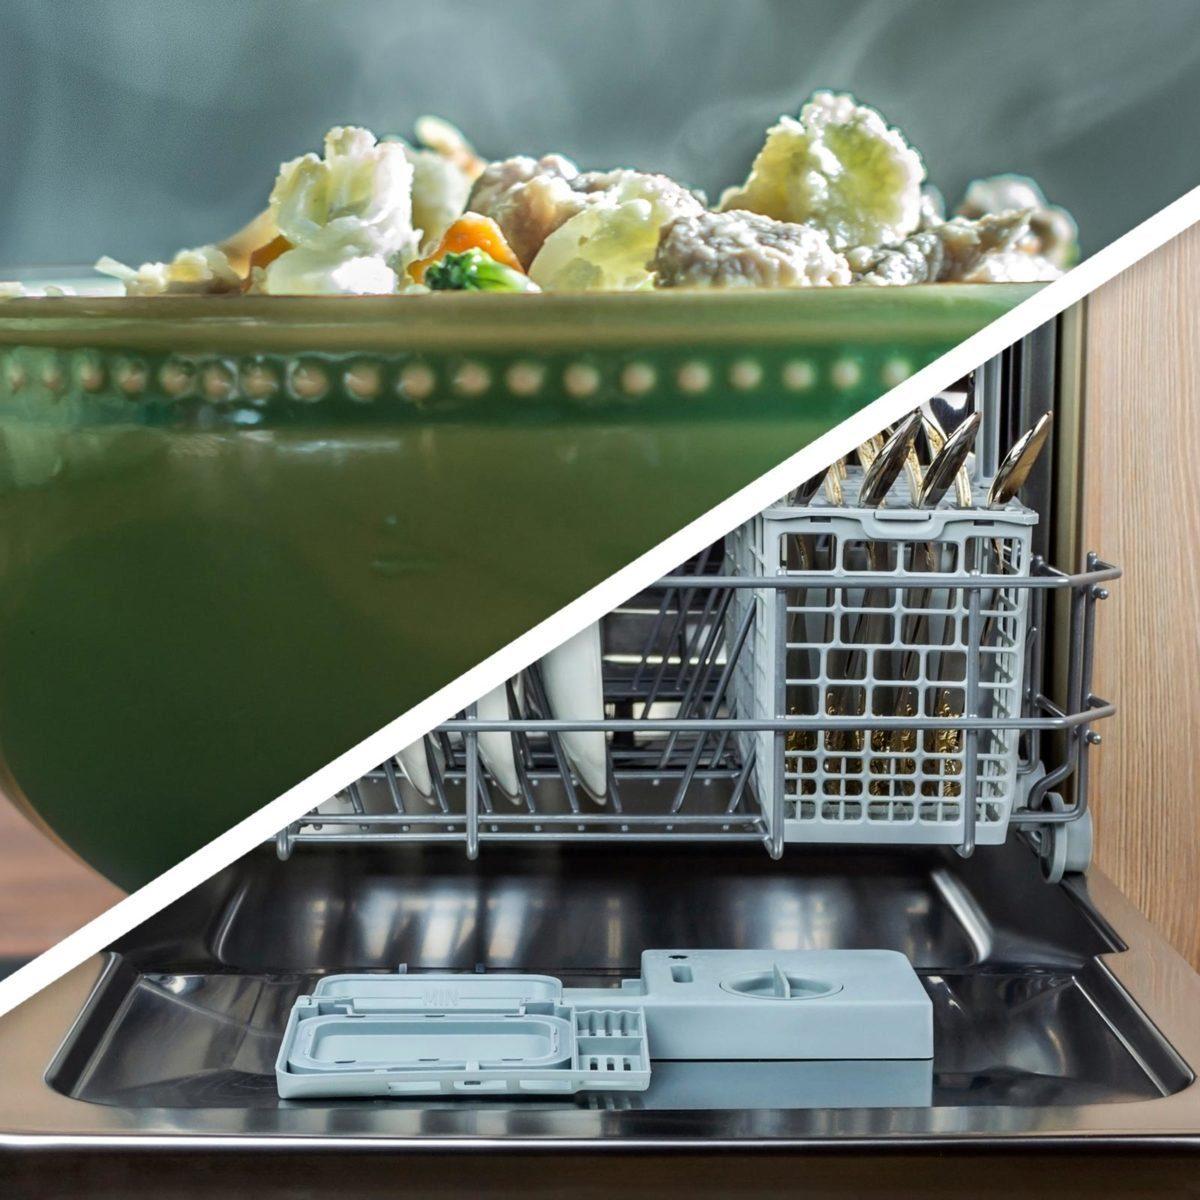 Steamed veggies and dishwasher